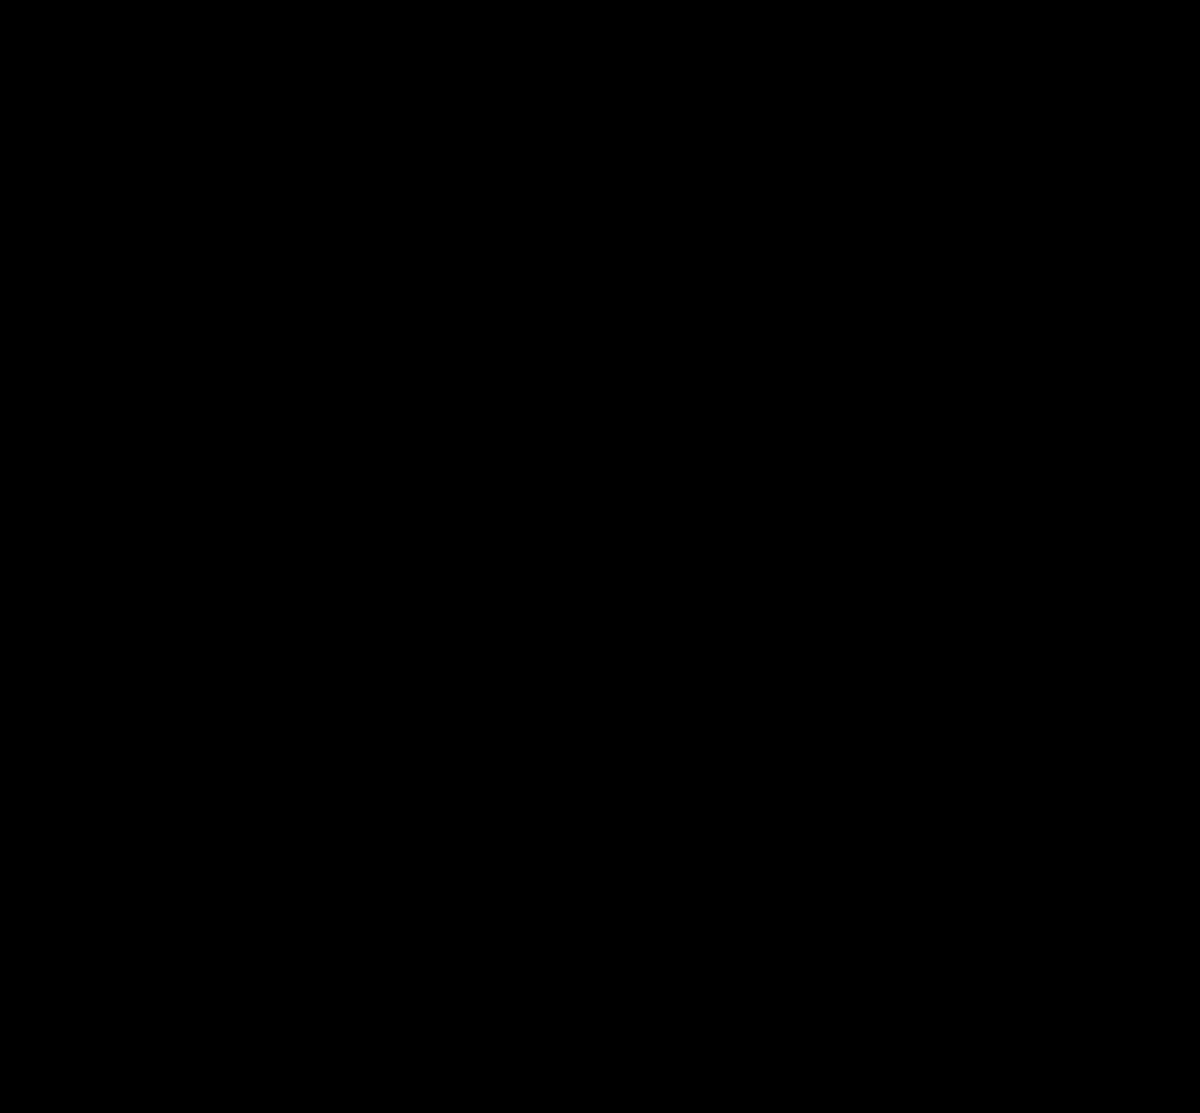 General formula of an aldehyde